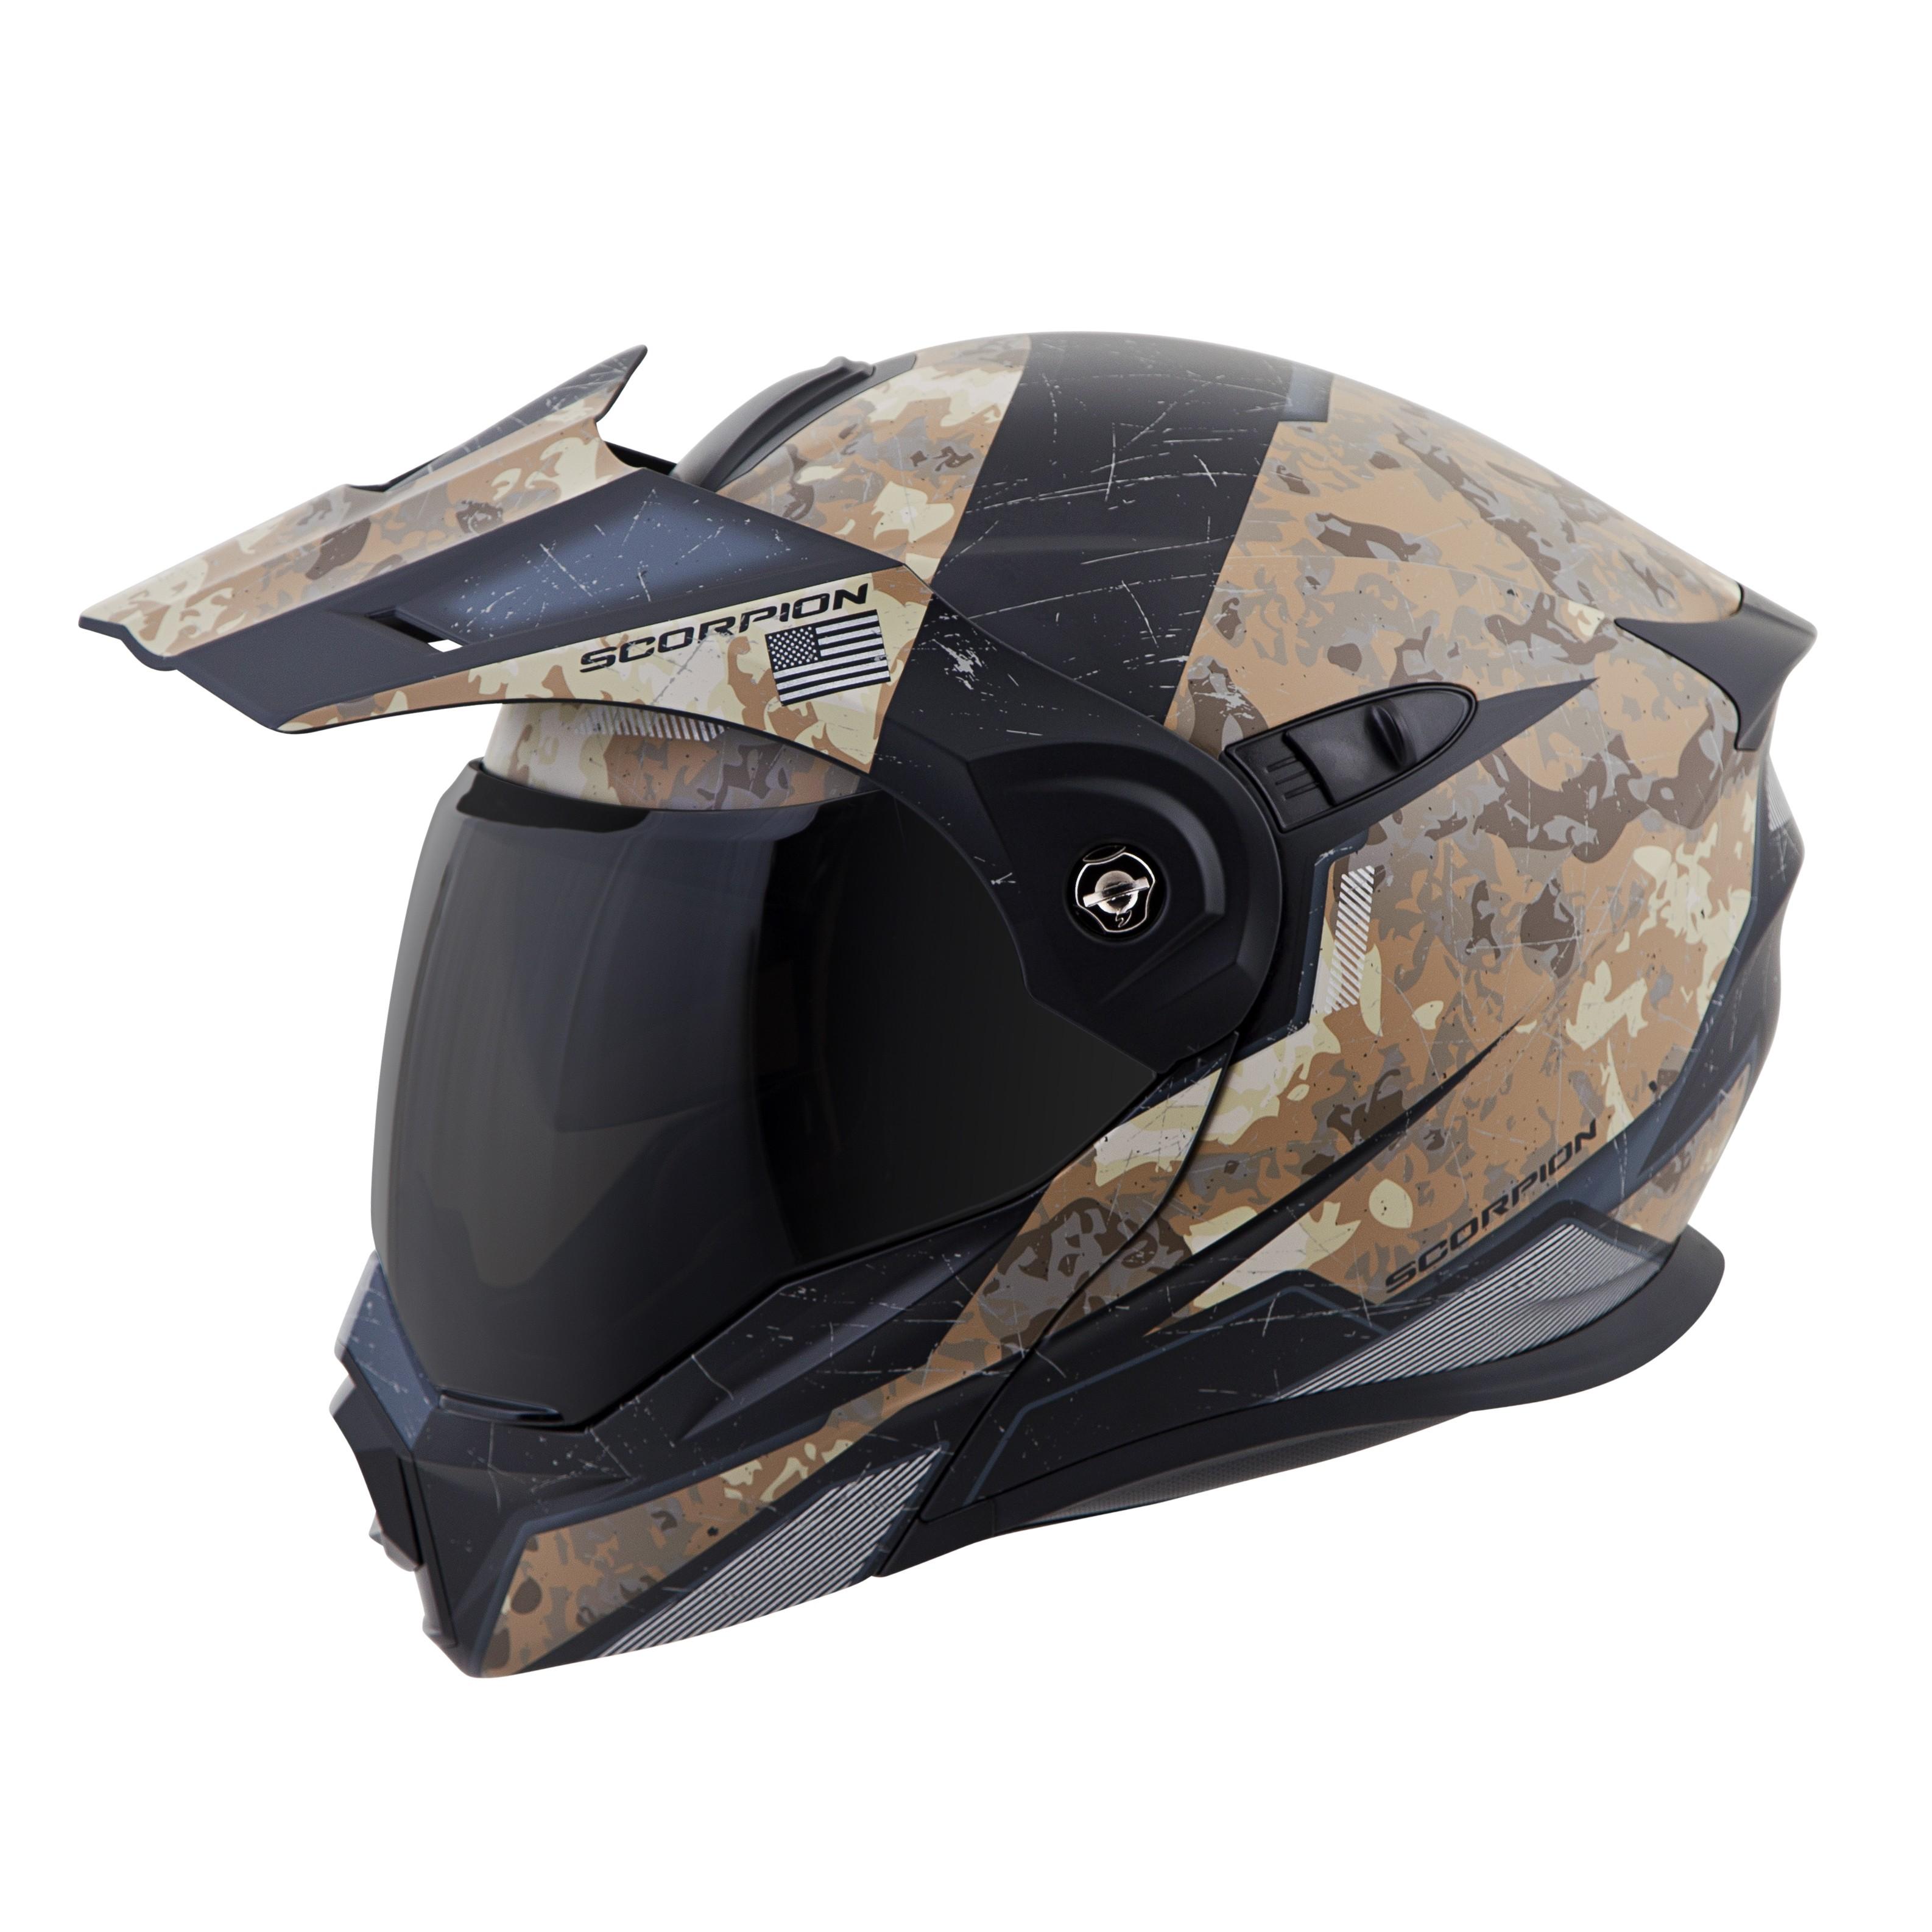 scorpion exo at950 battleflage motorcycle street helmet. Black Bedroom Furniture Sets. Home Design Ideas